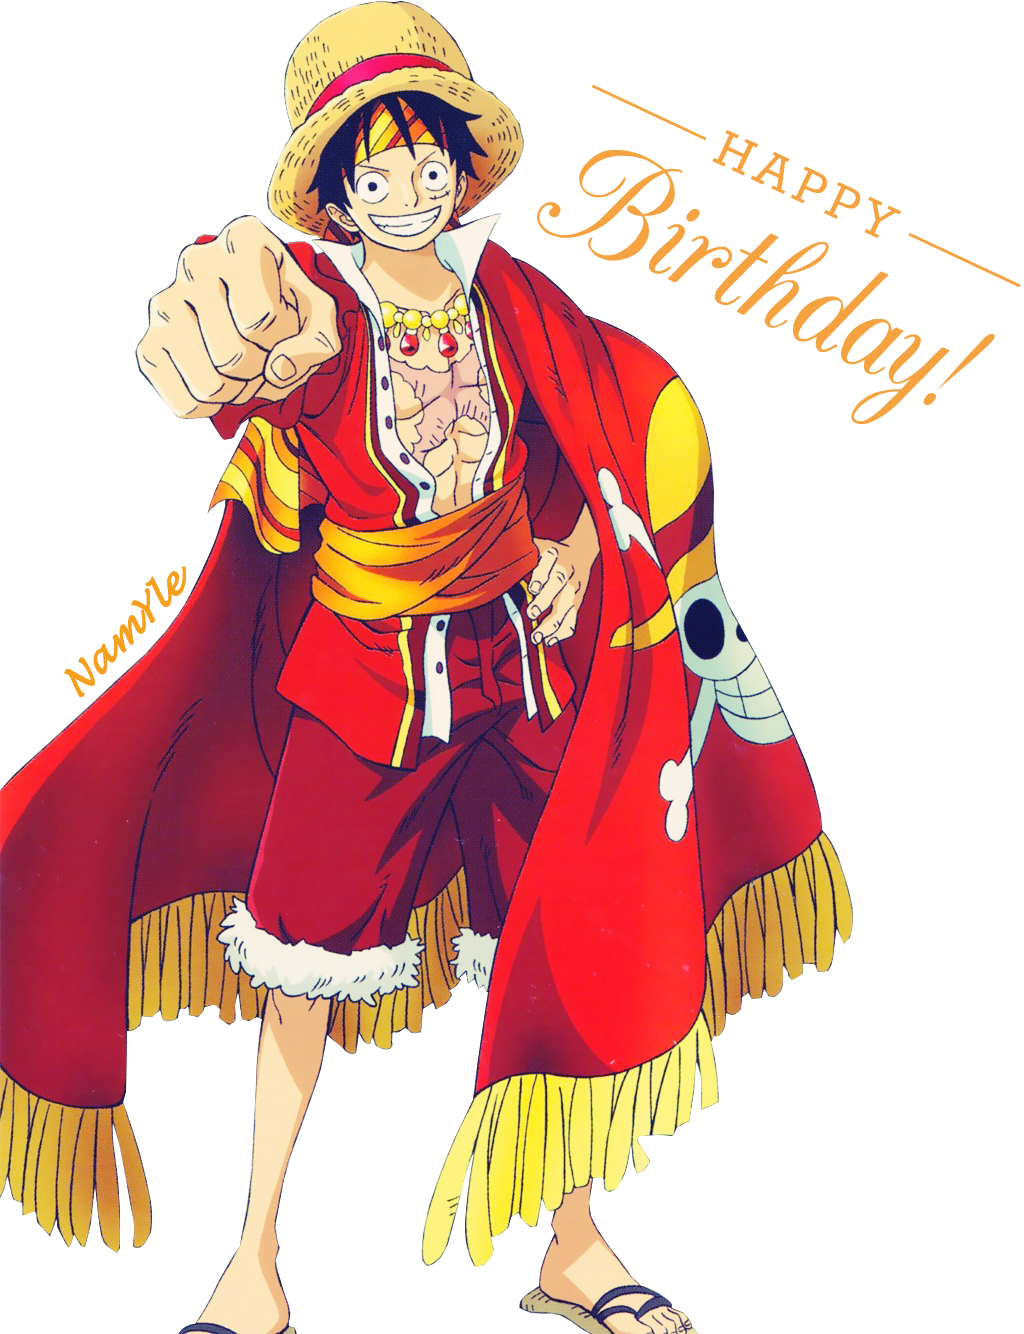 Birthday Calendar One Piece : Happy birthday to luffy render by namyle on deviantart